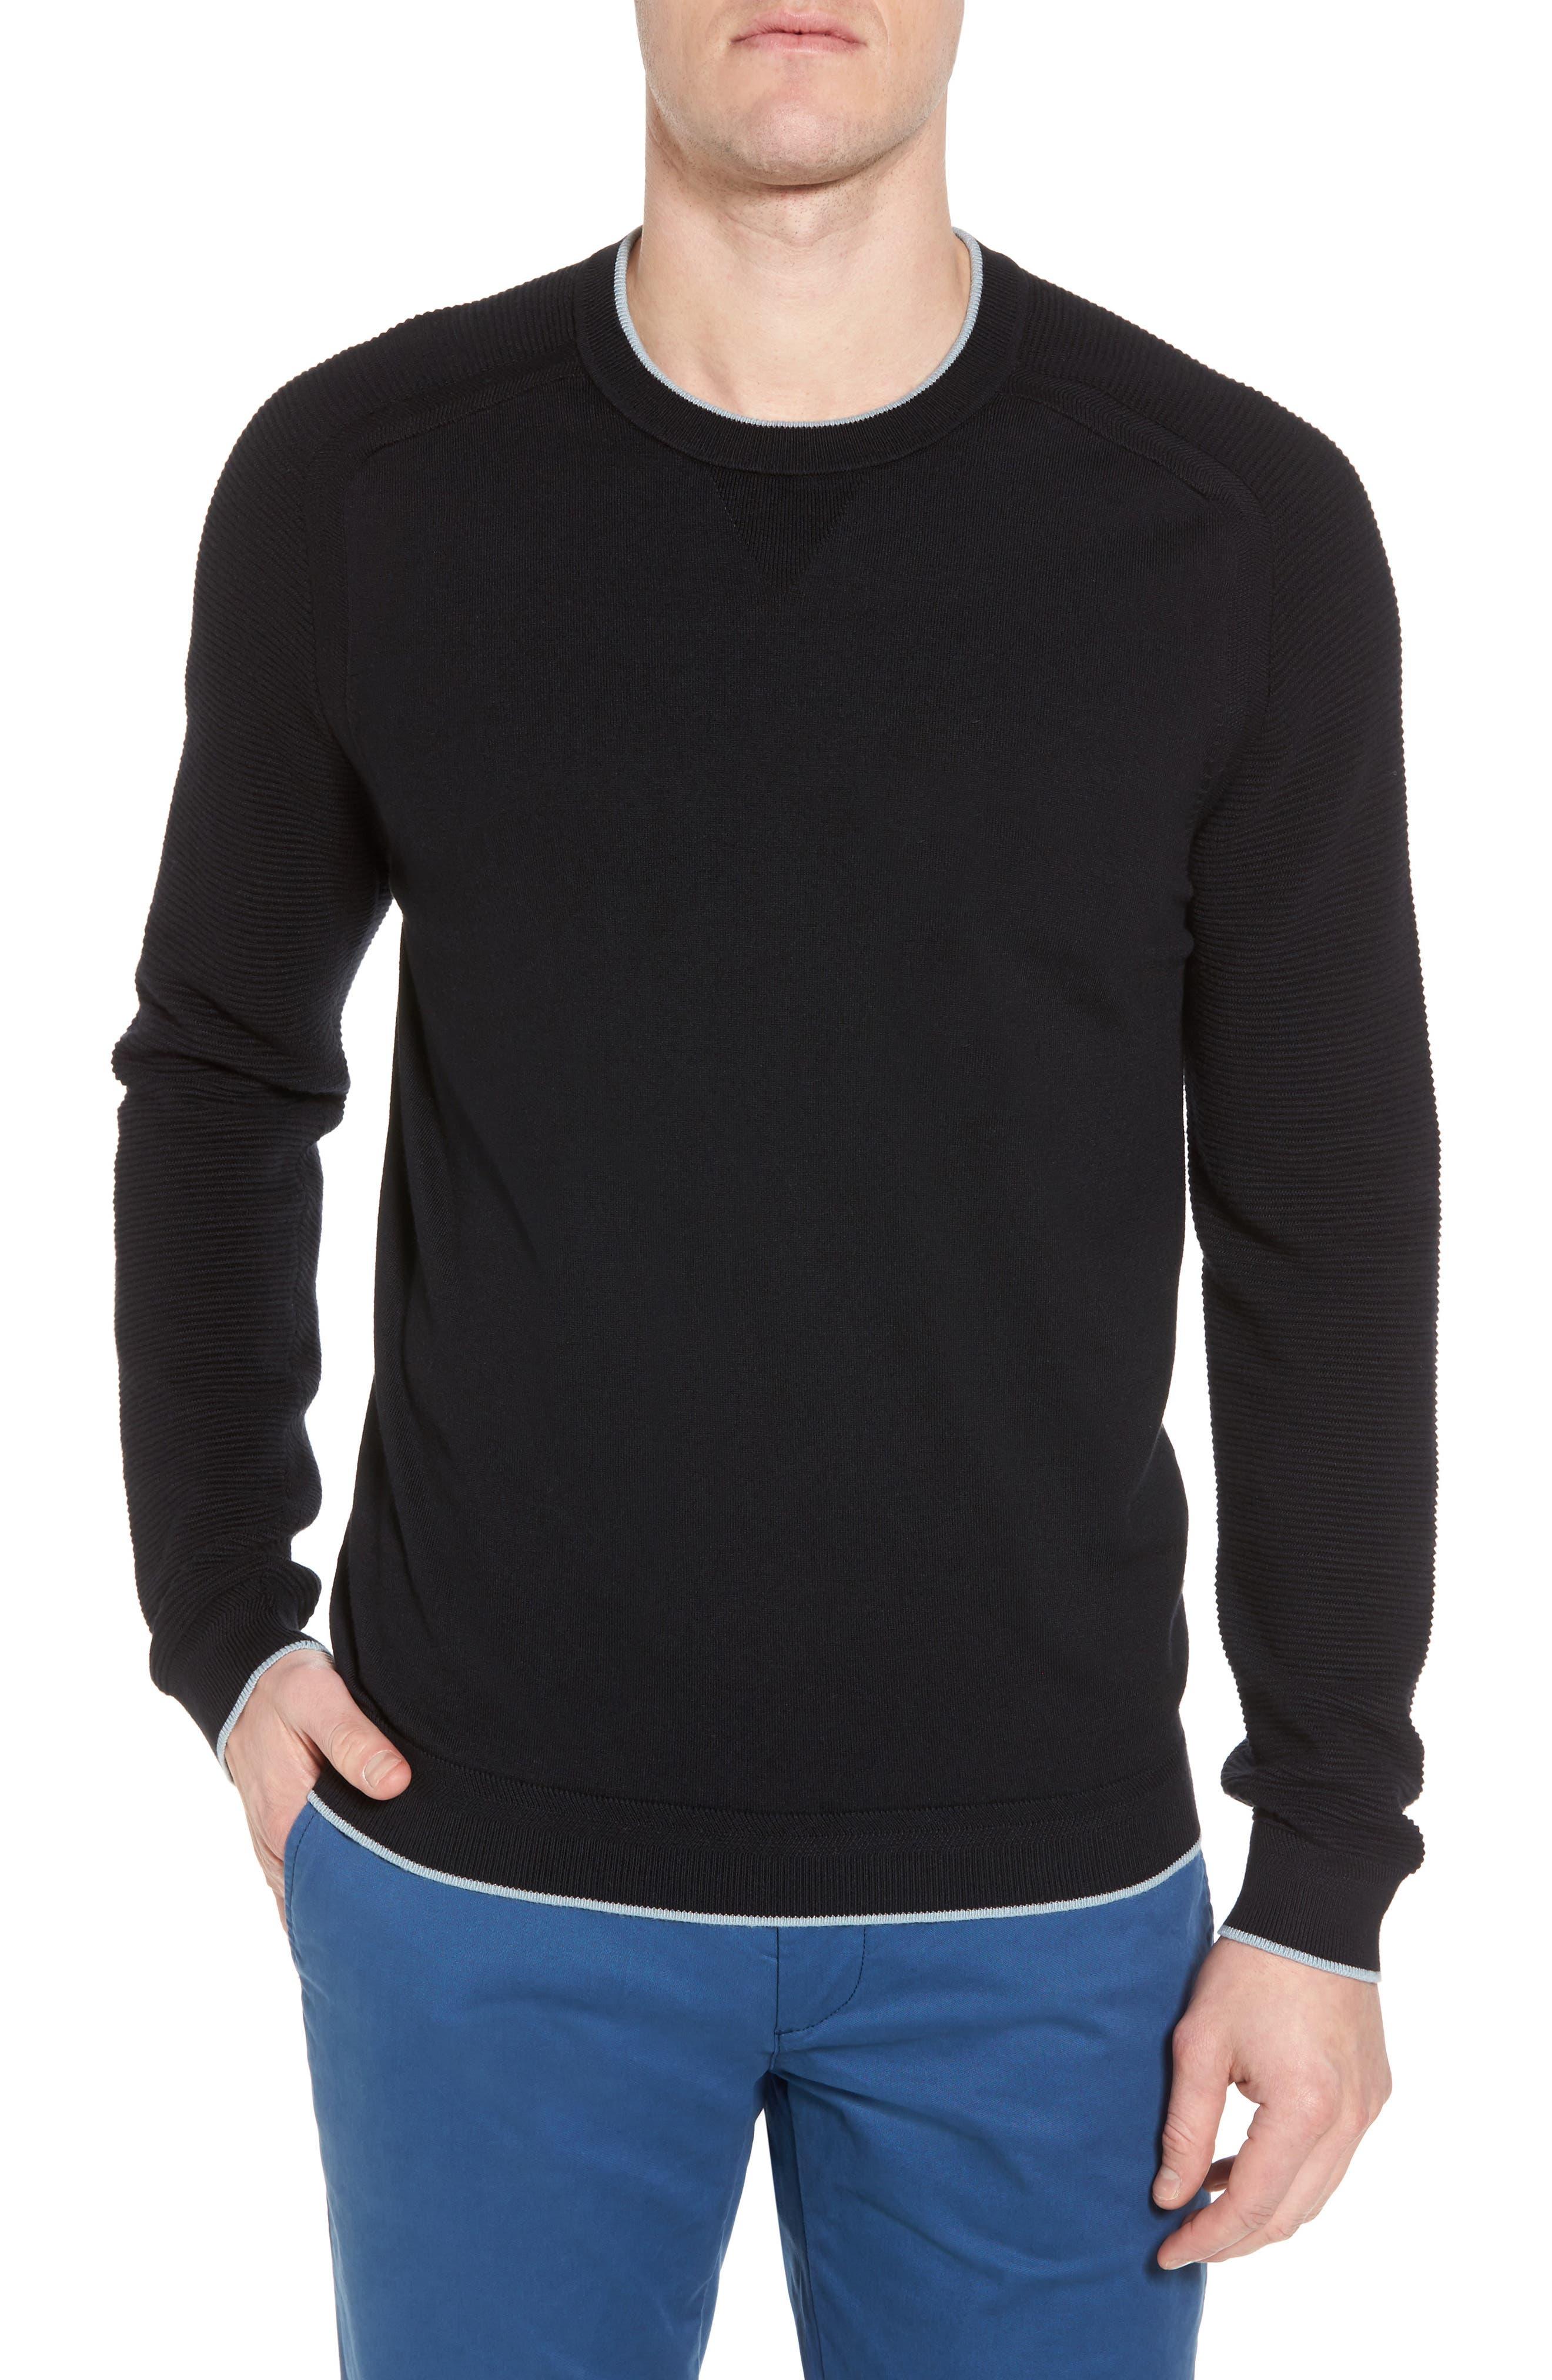 Kayfed Rib Sleeve Sweater,                             Main thumbnail 1, color,                             001